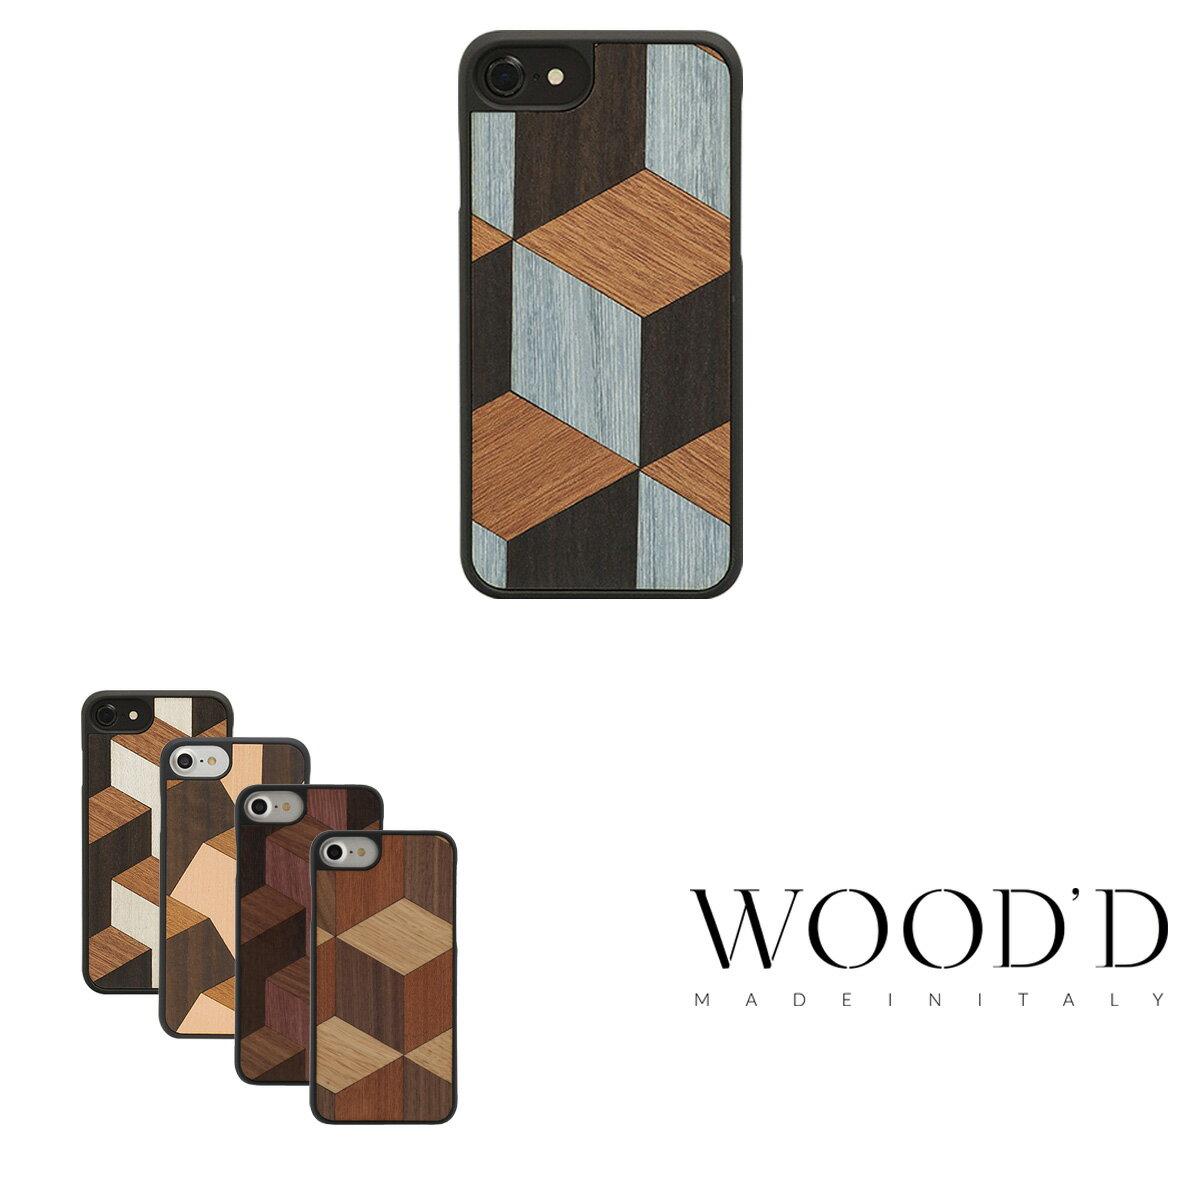 Wood'd iPhone8 iPhone7 iPhone6 ケース Real wood Snap-on covers GEOMETRIC ウッド 【 アイフォン スマホケース スマートフォン カバー 木製 ハンドメイド イタリア製 】[bef][PO10][即日発送]